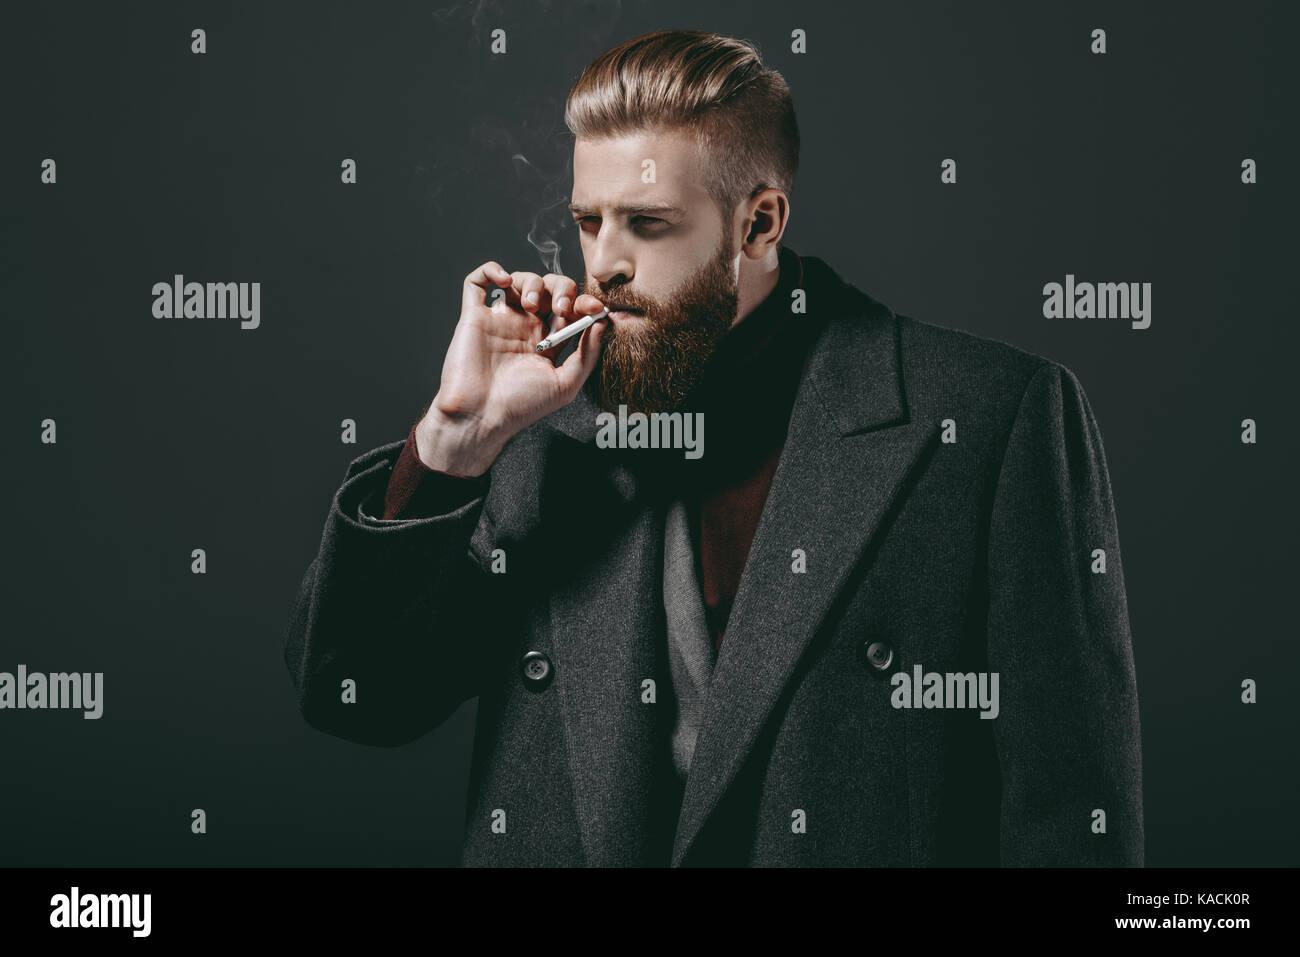 stylish man smoking cigarette - Stock Image